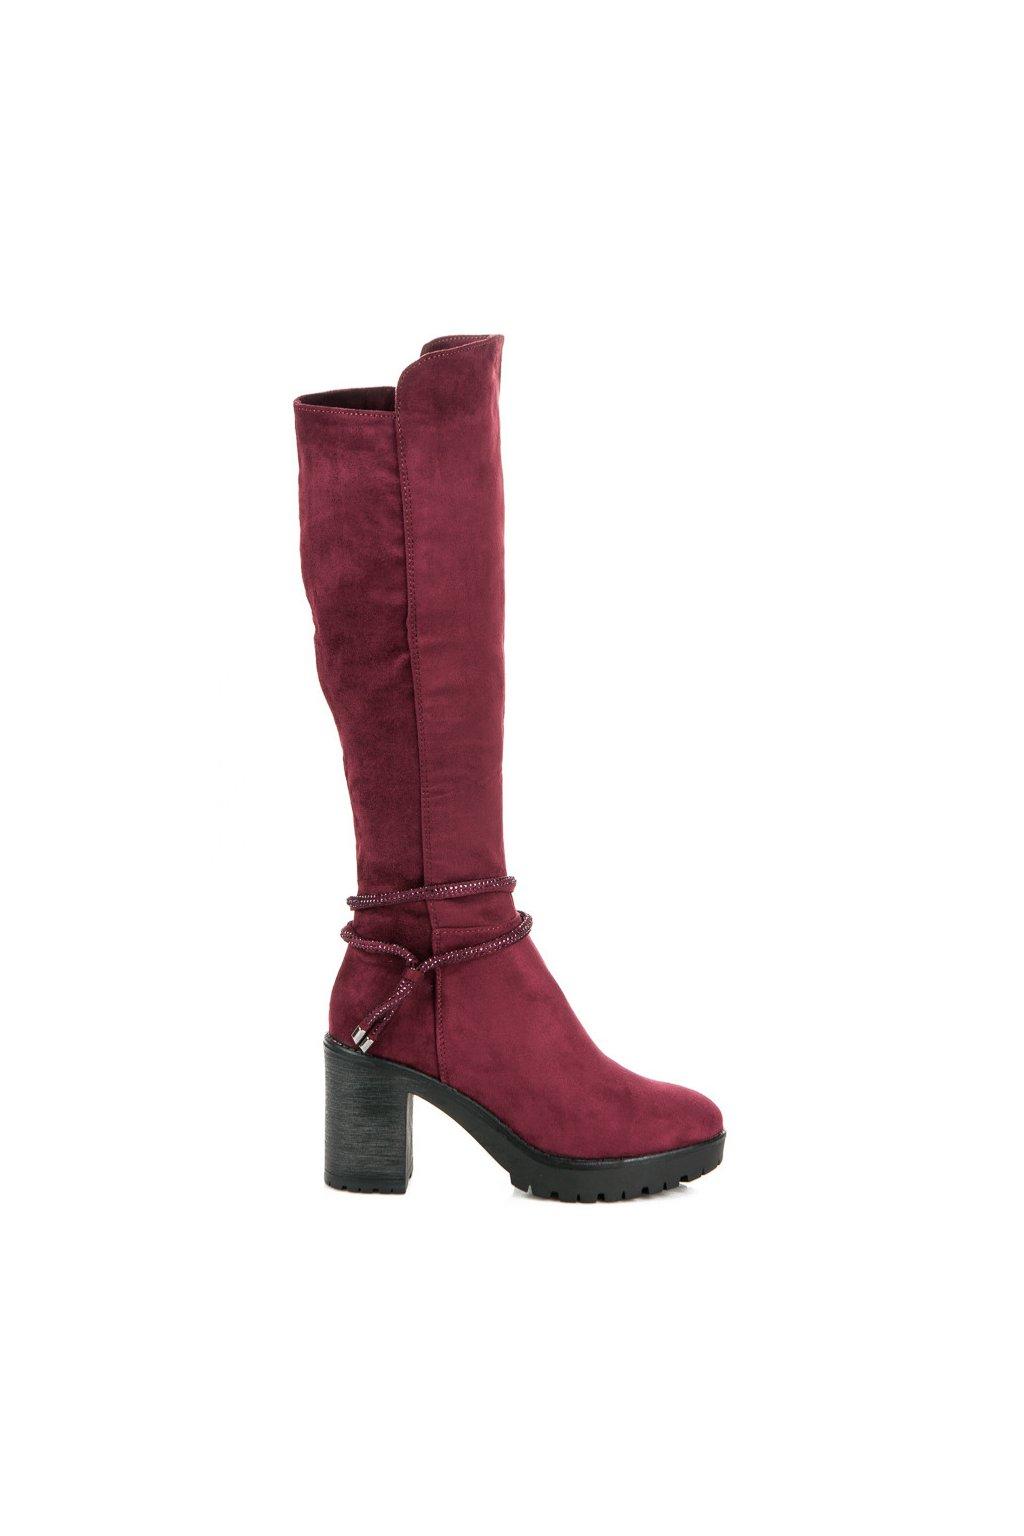 5082ad840c50 Dámska obuv ccc